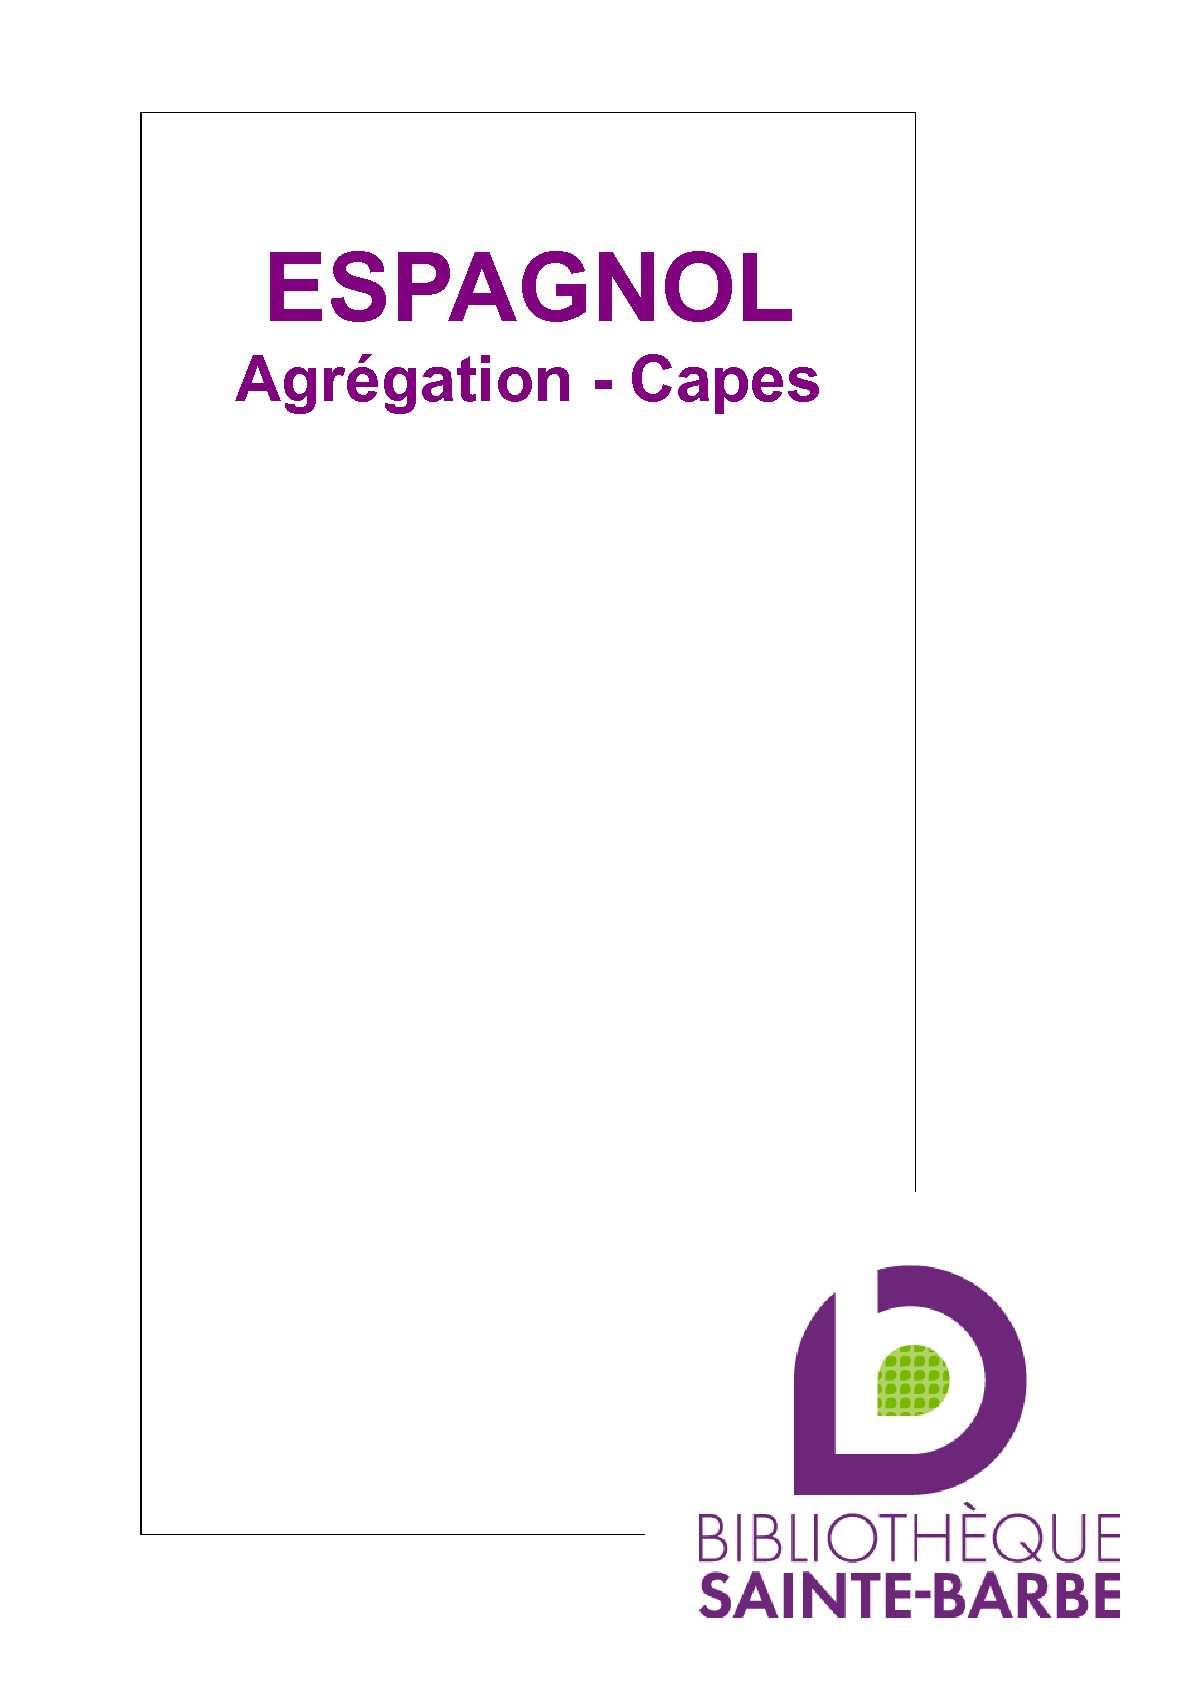 capes interne espagnol